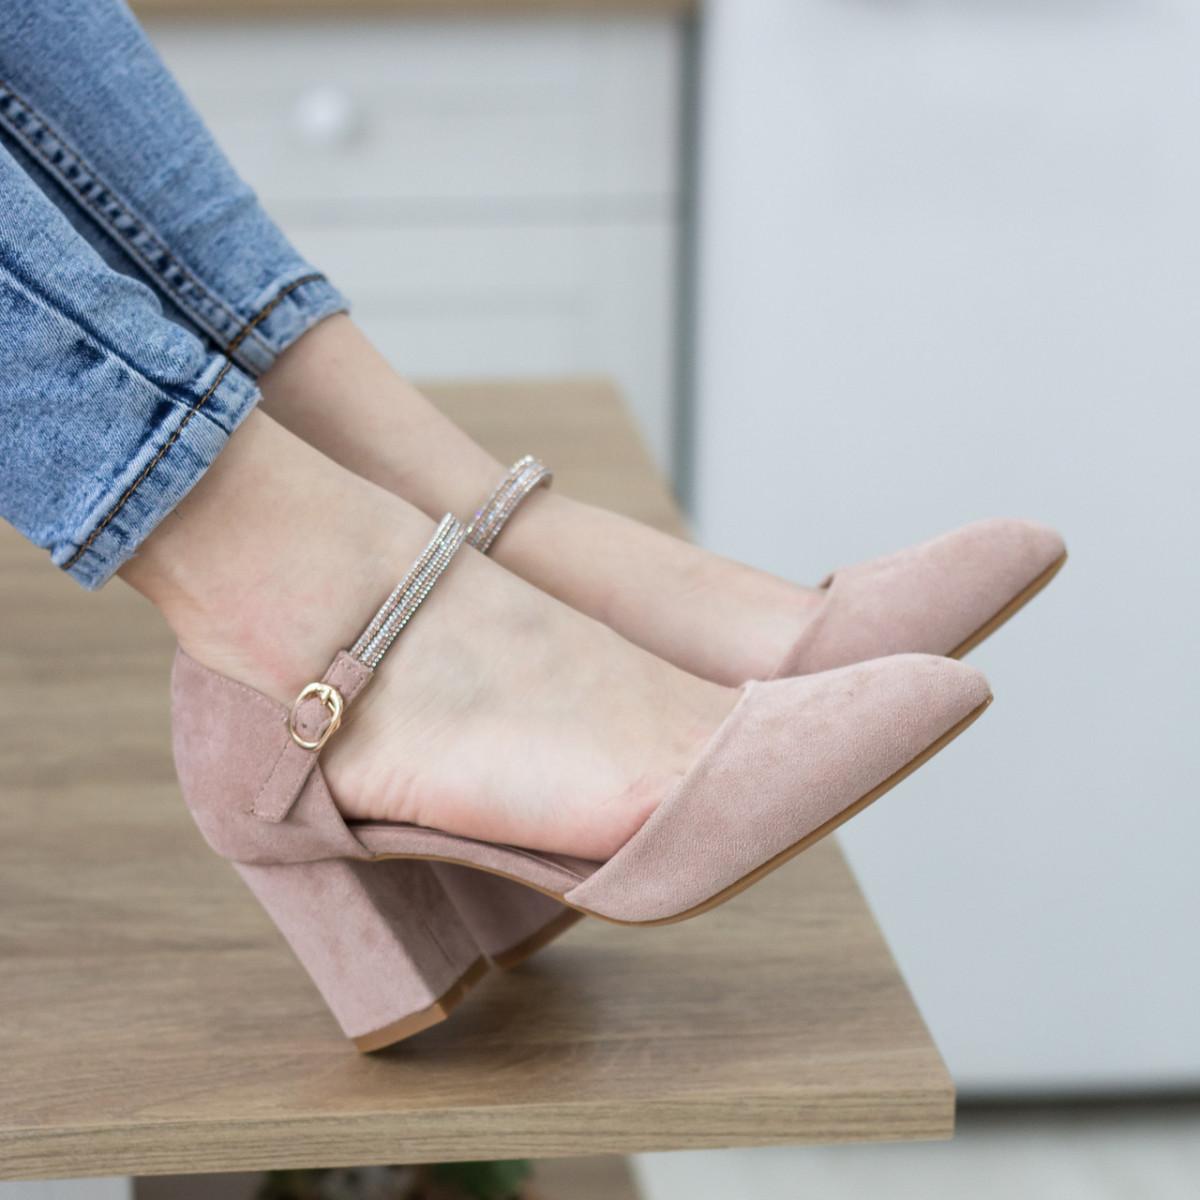 Туфли женские Fashion Ababa 2724 37 размер 24 см Бежевый